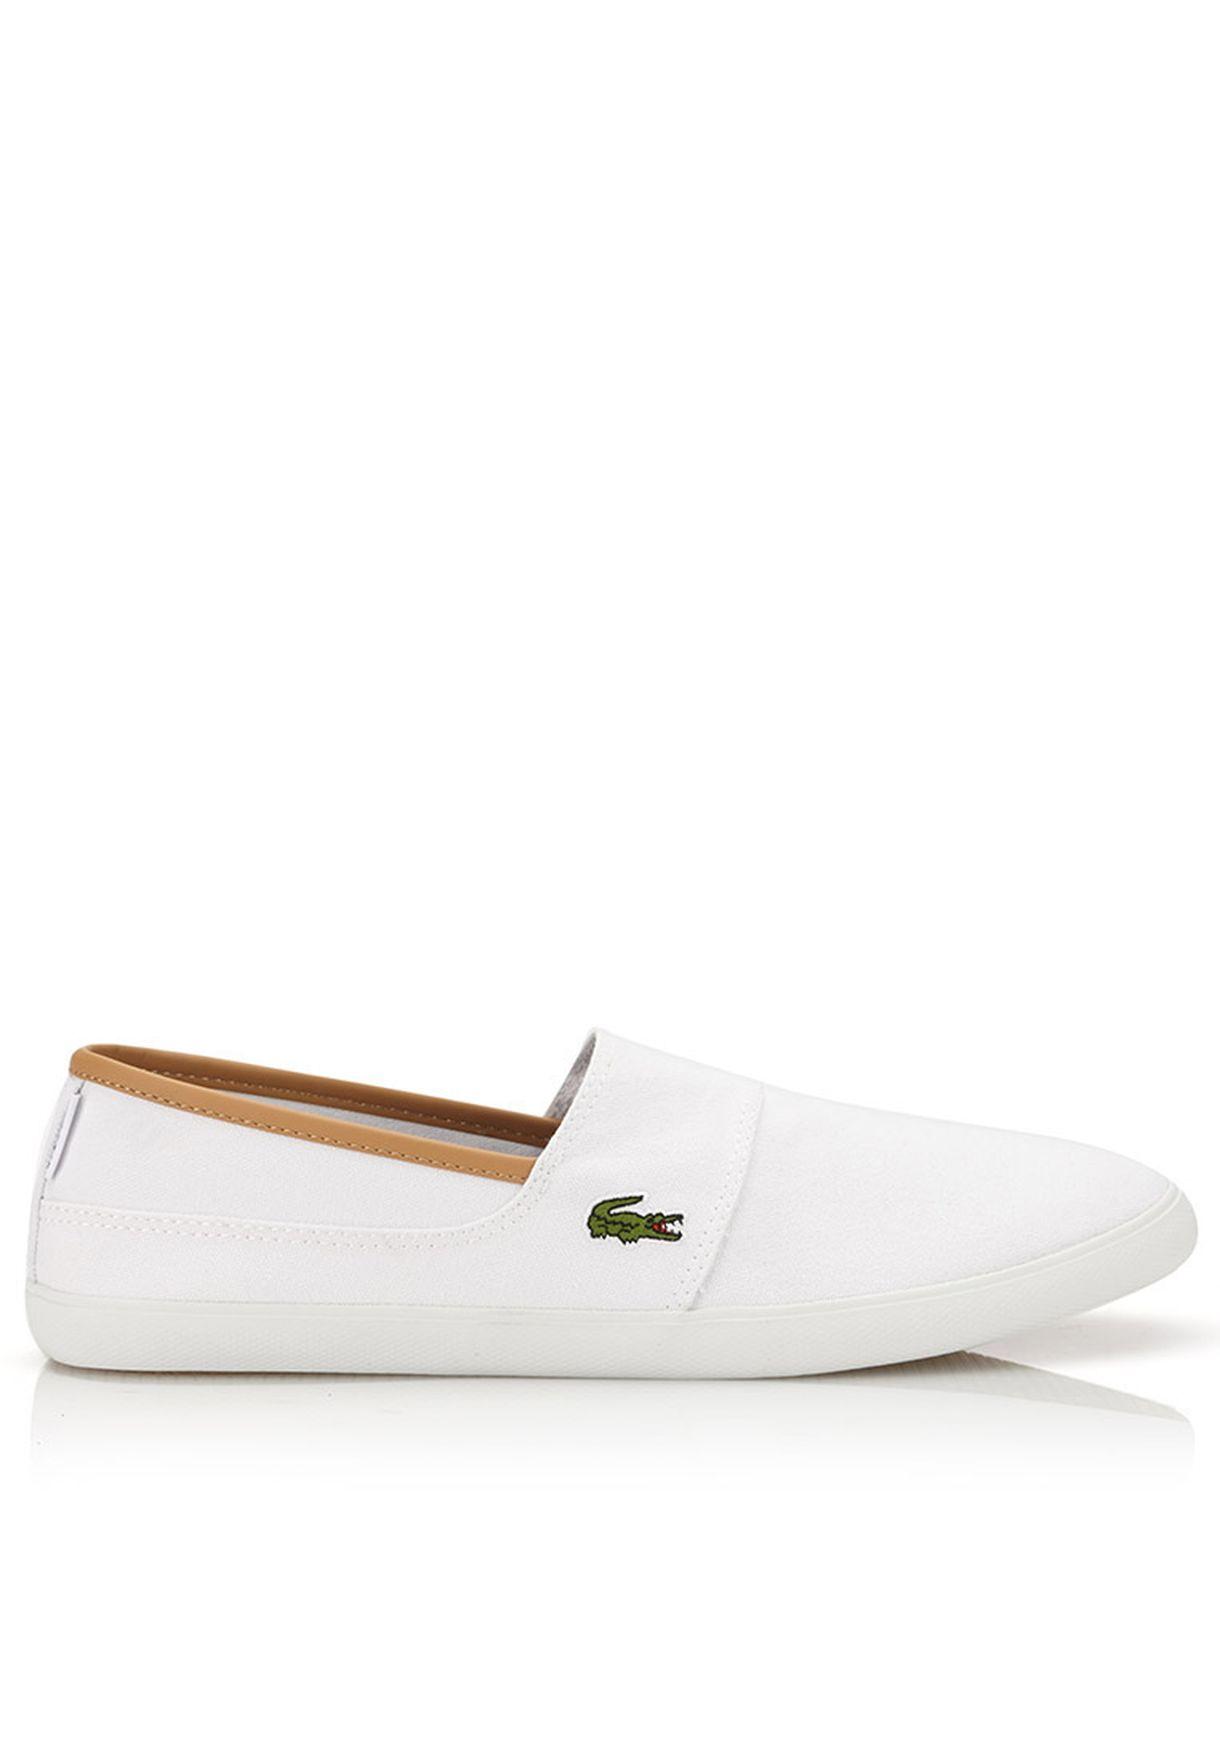 f6ac10b8e3541 Shop Lacoste white Marice EOS Slip ons 28SPM0103-21G for Men in ...